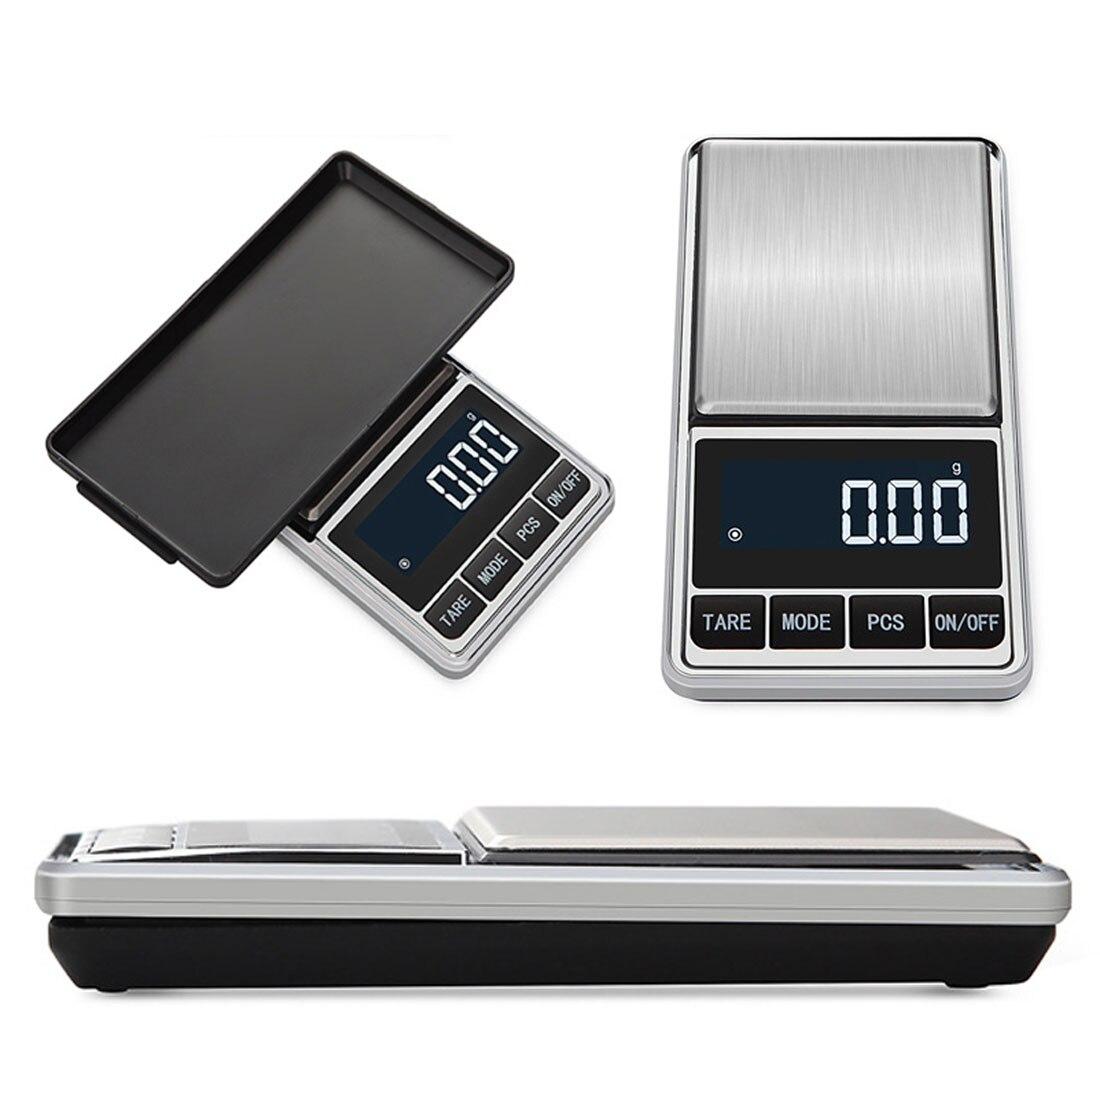 500*0,1g/100*0,01g Mini Digital Waagen Tasche Schmuck Waagen Präzision Elektronische Balance Gewicht Balanca digitale Skala